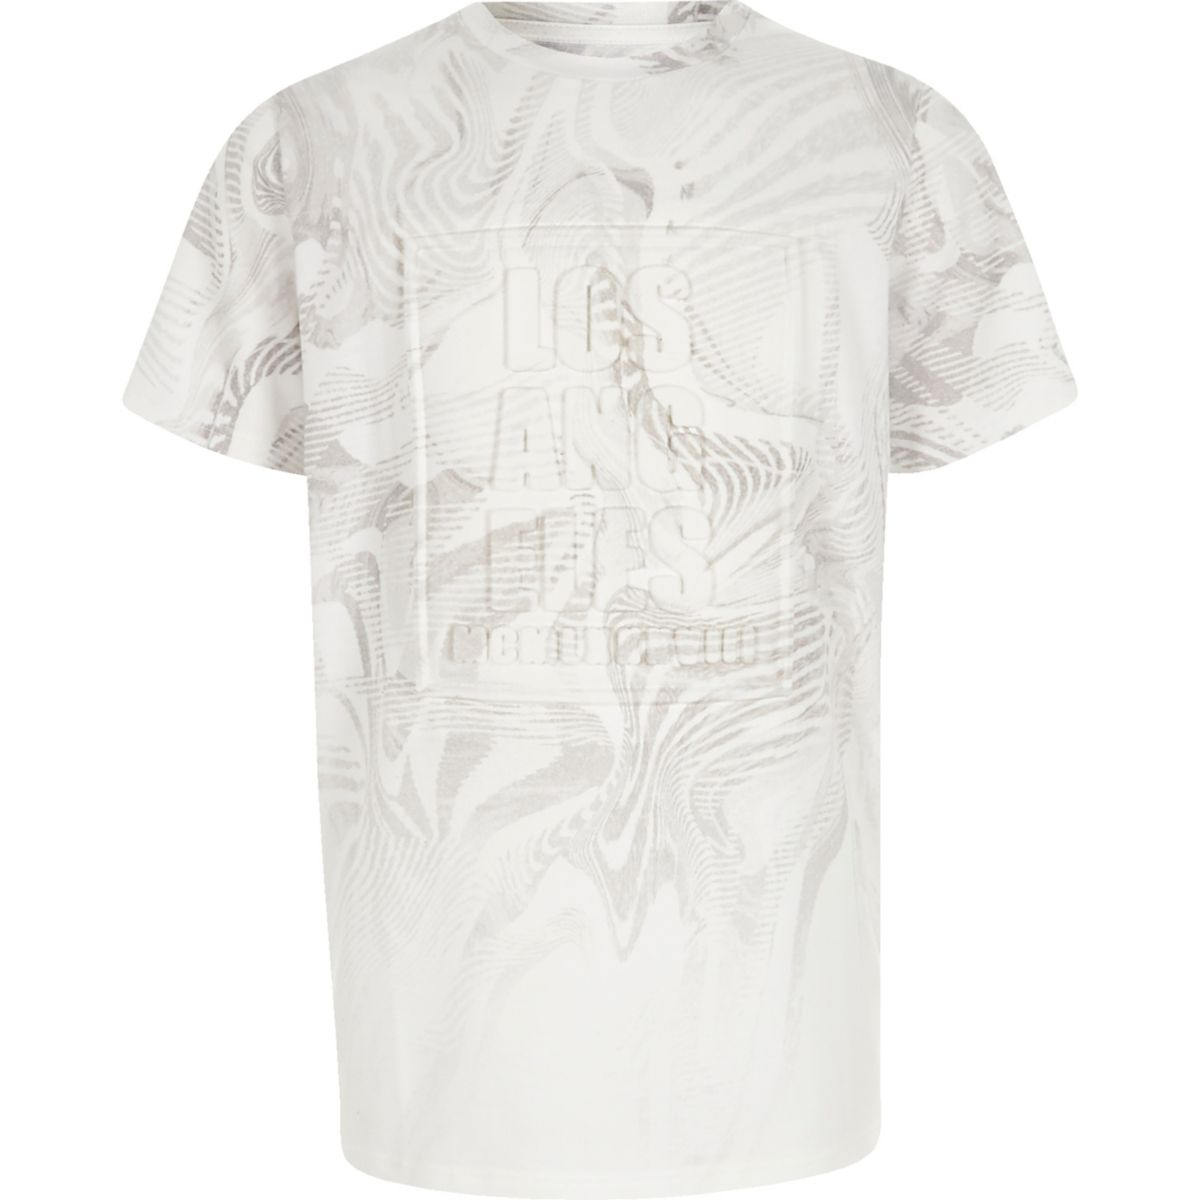 Boys white 'Los Angeles' embossed T-shirt